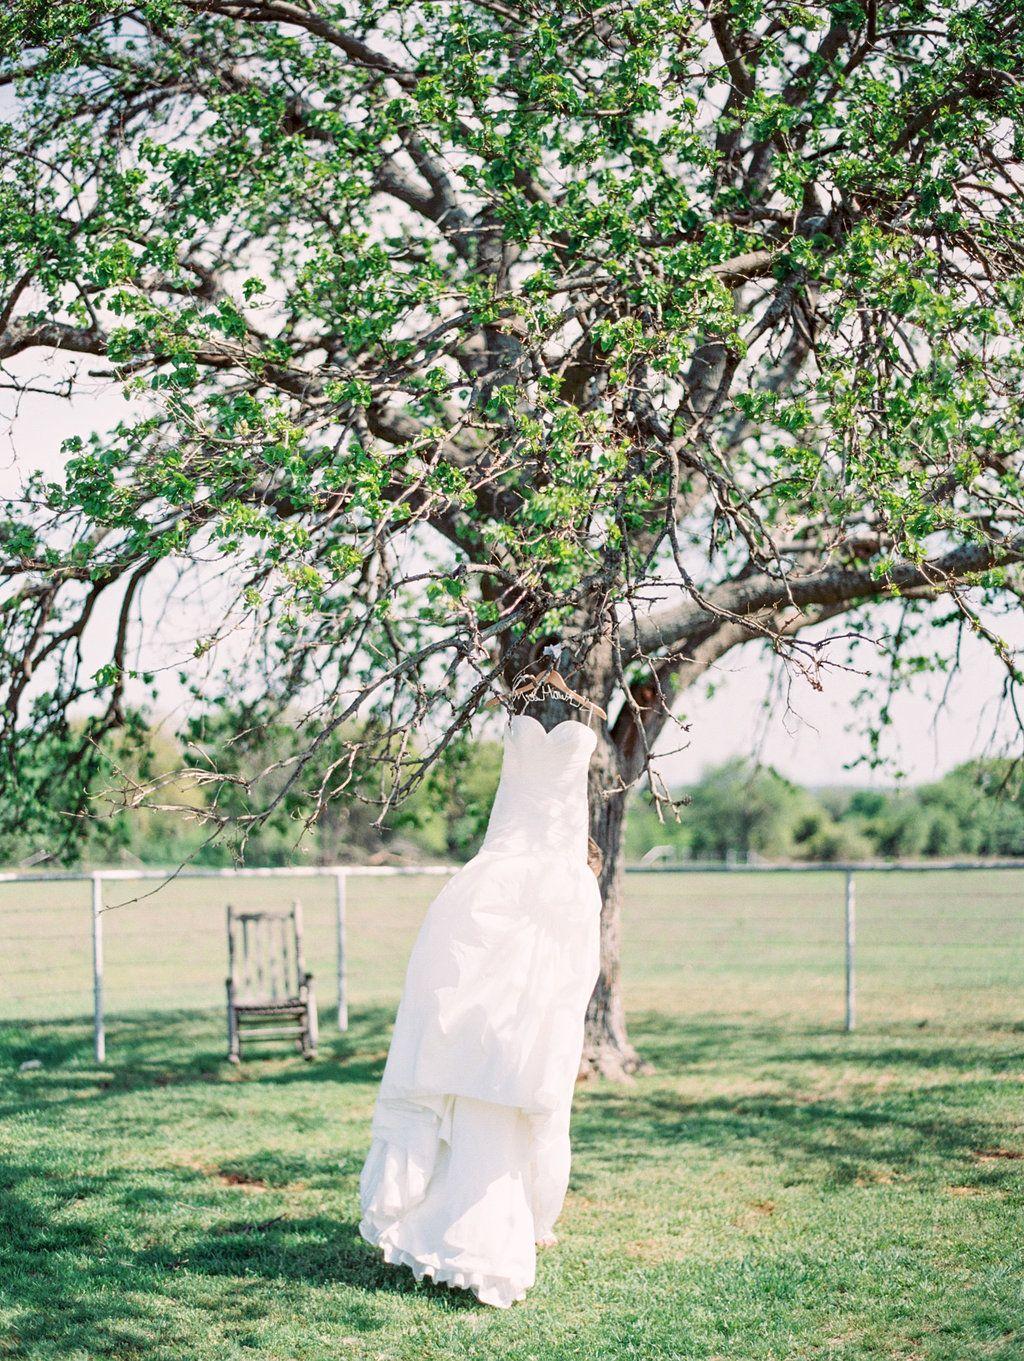 outdoor wedding venues in fort worth tx%0A Flying V Ranch Event Venue   www flyingvranch com Dallas  Fort Worth